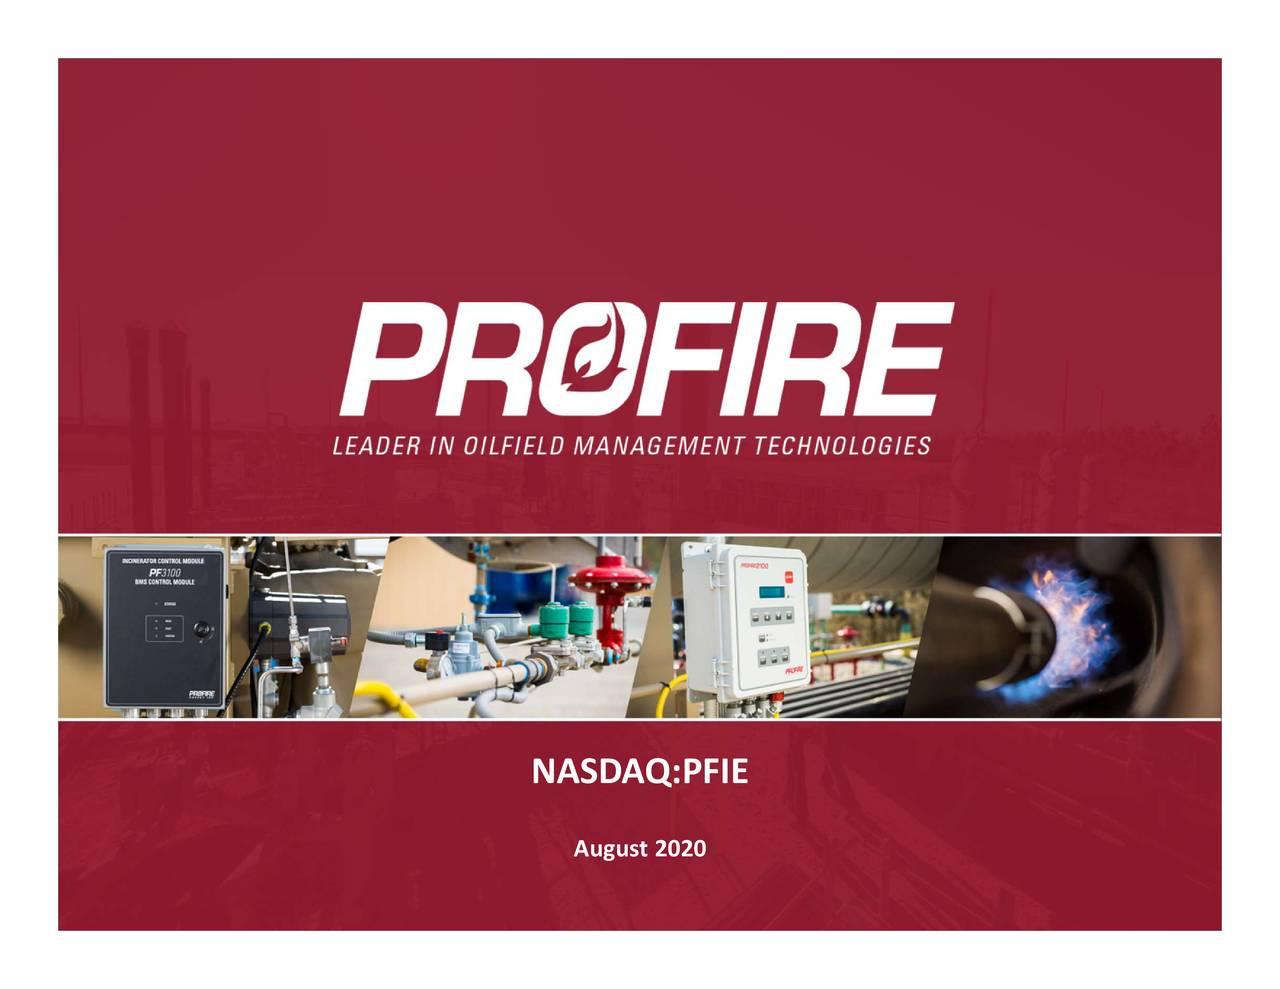 Profire Energy, Inc. 2020 Q2 - Results - Earnings Call Presentation (NASDAQ:PFIE)